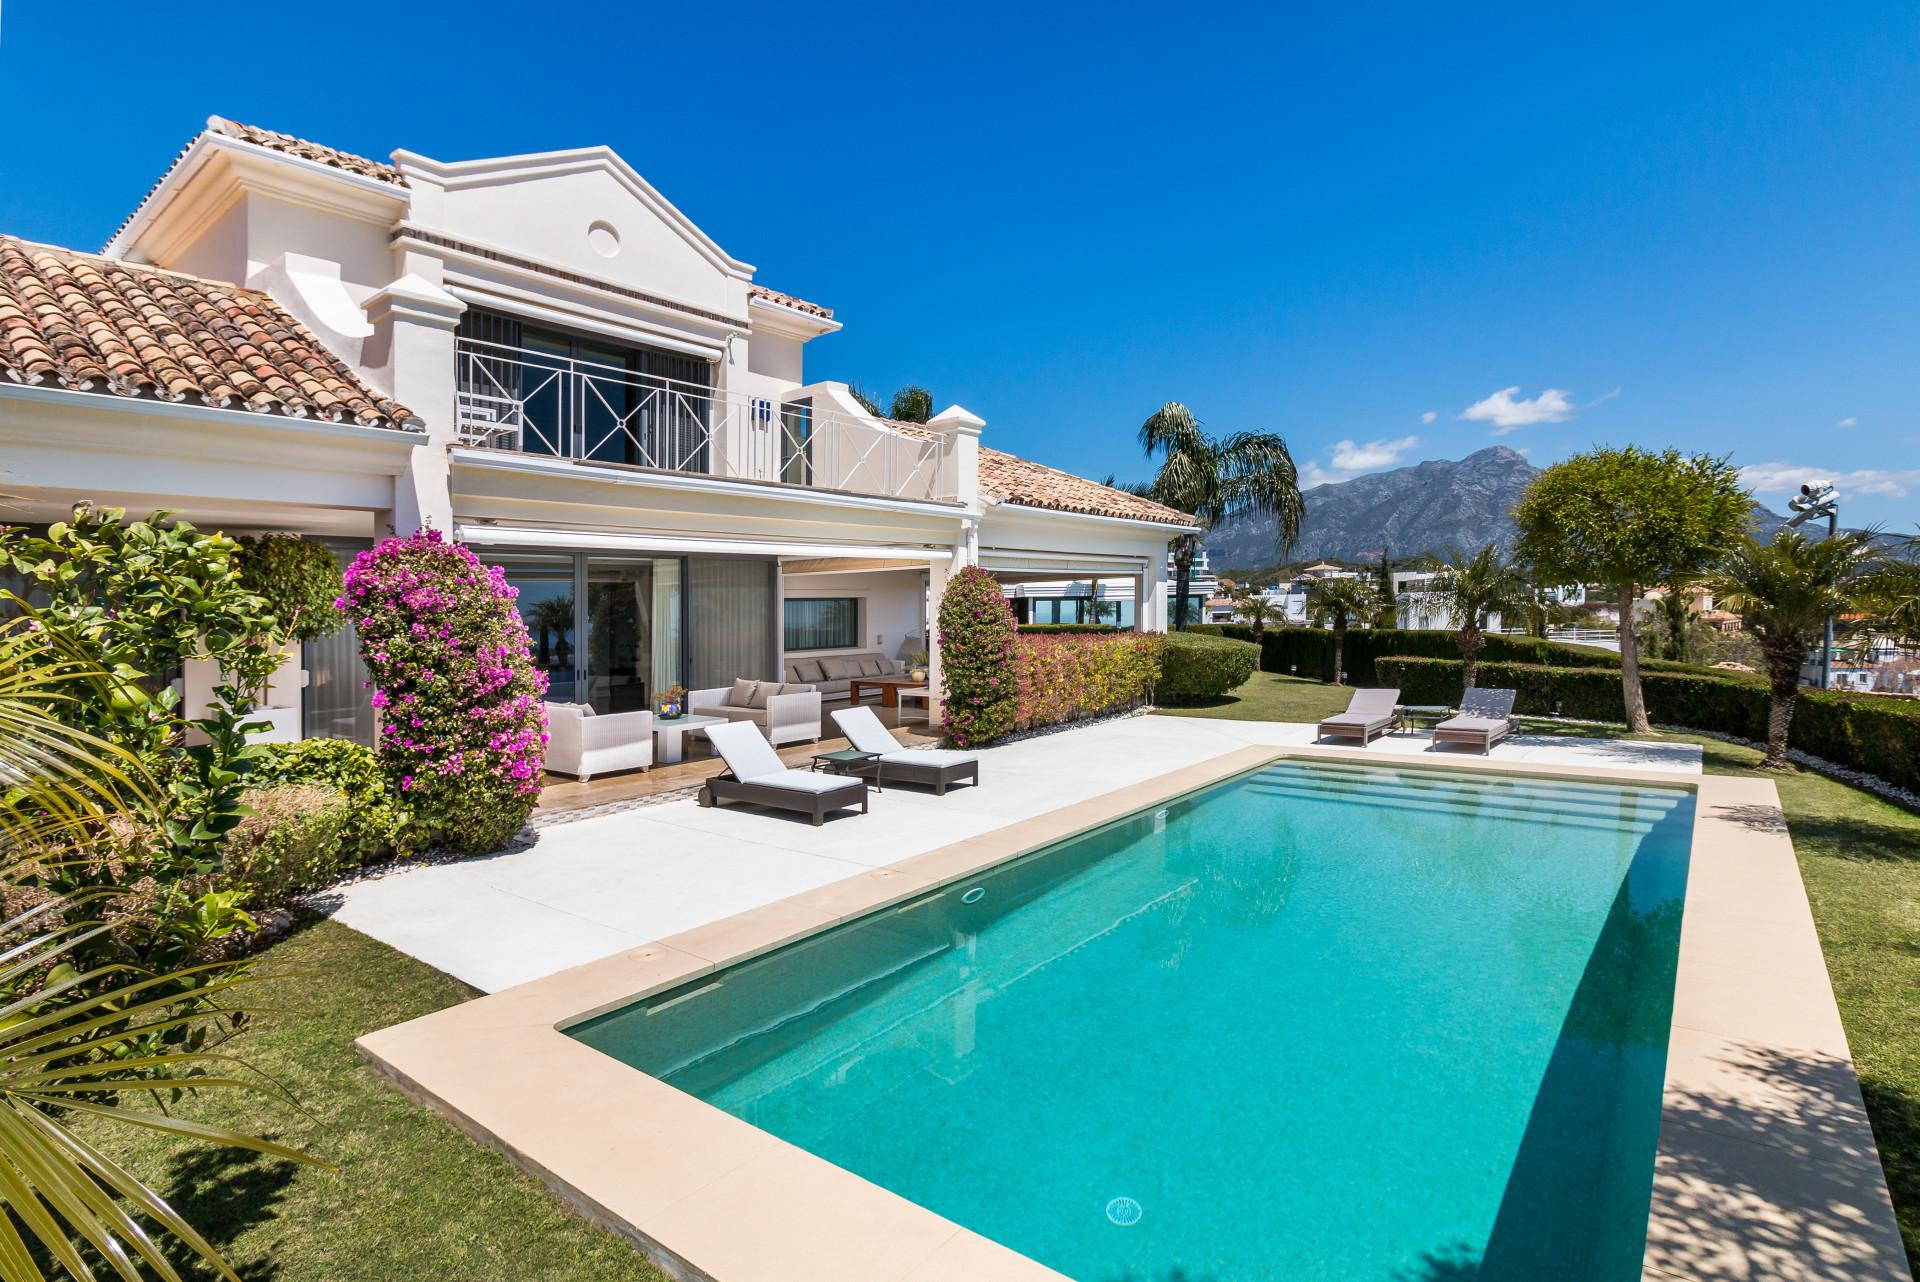 ARFV2061 - Renovierte Villa mit Panorama Meerblick zu verkaufen in La Quinta